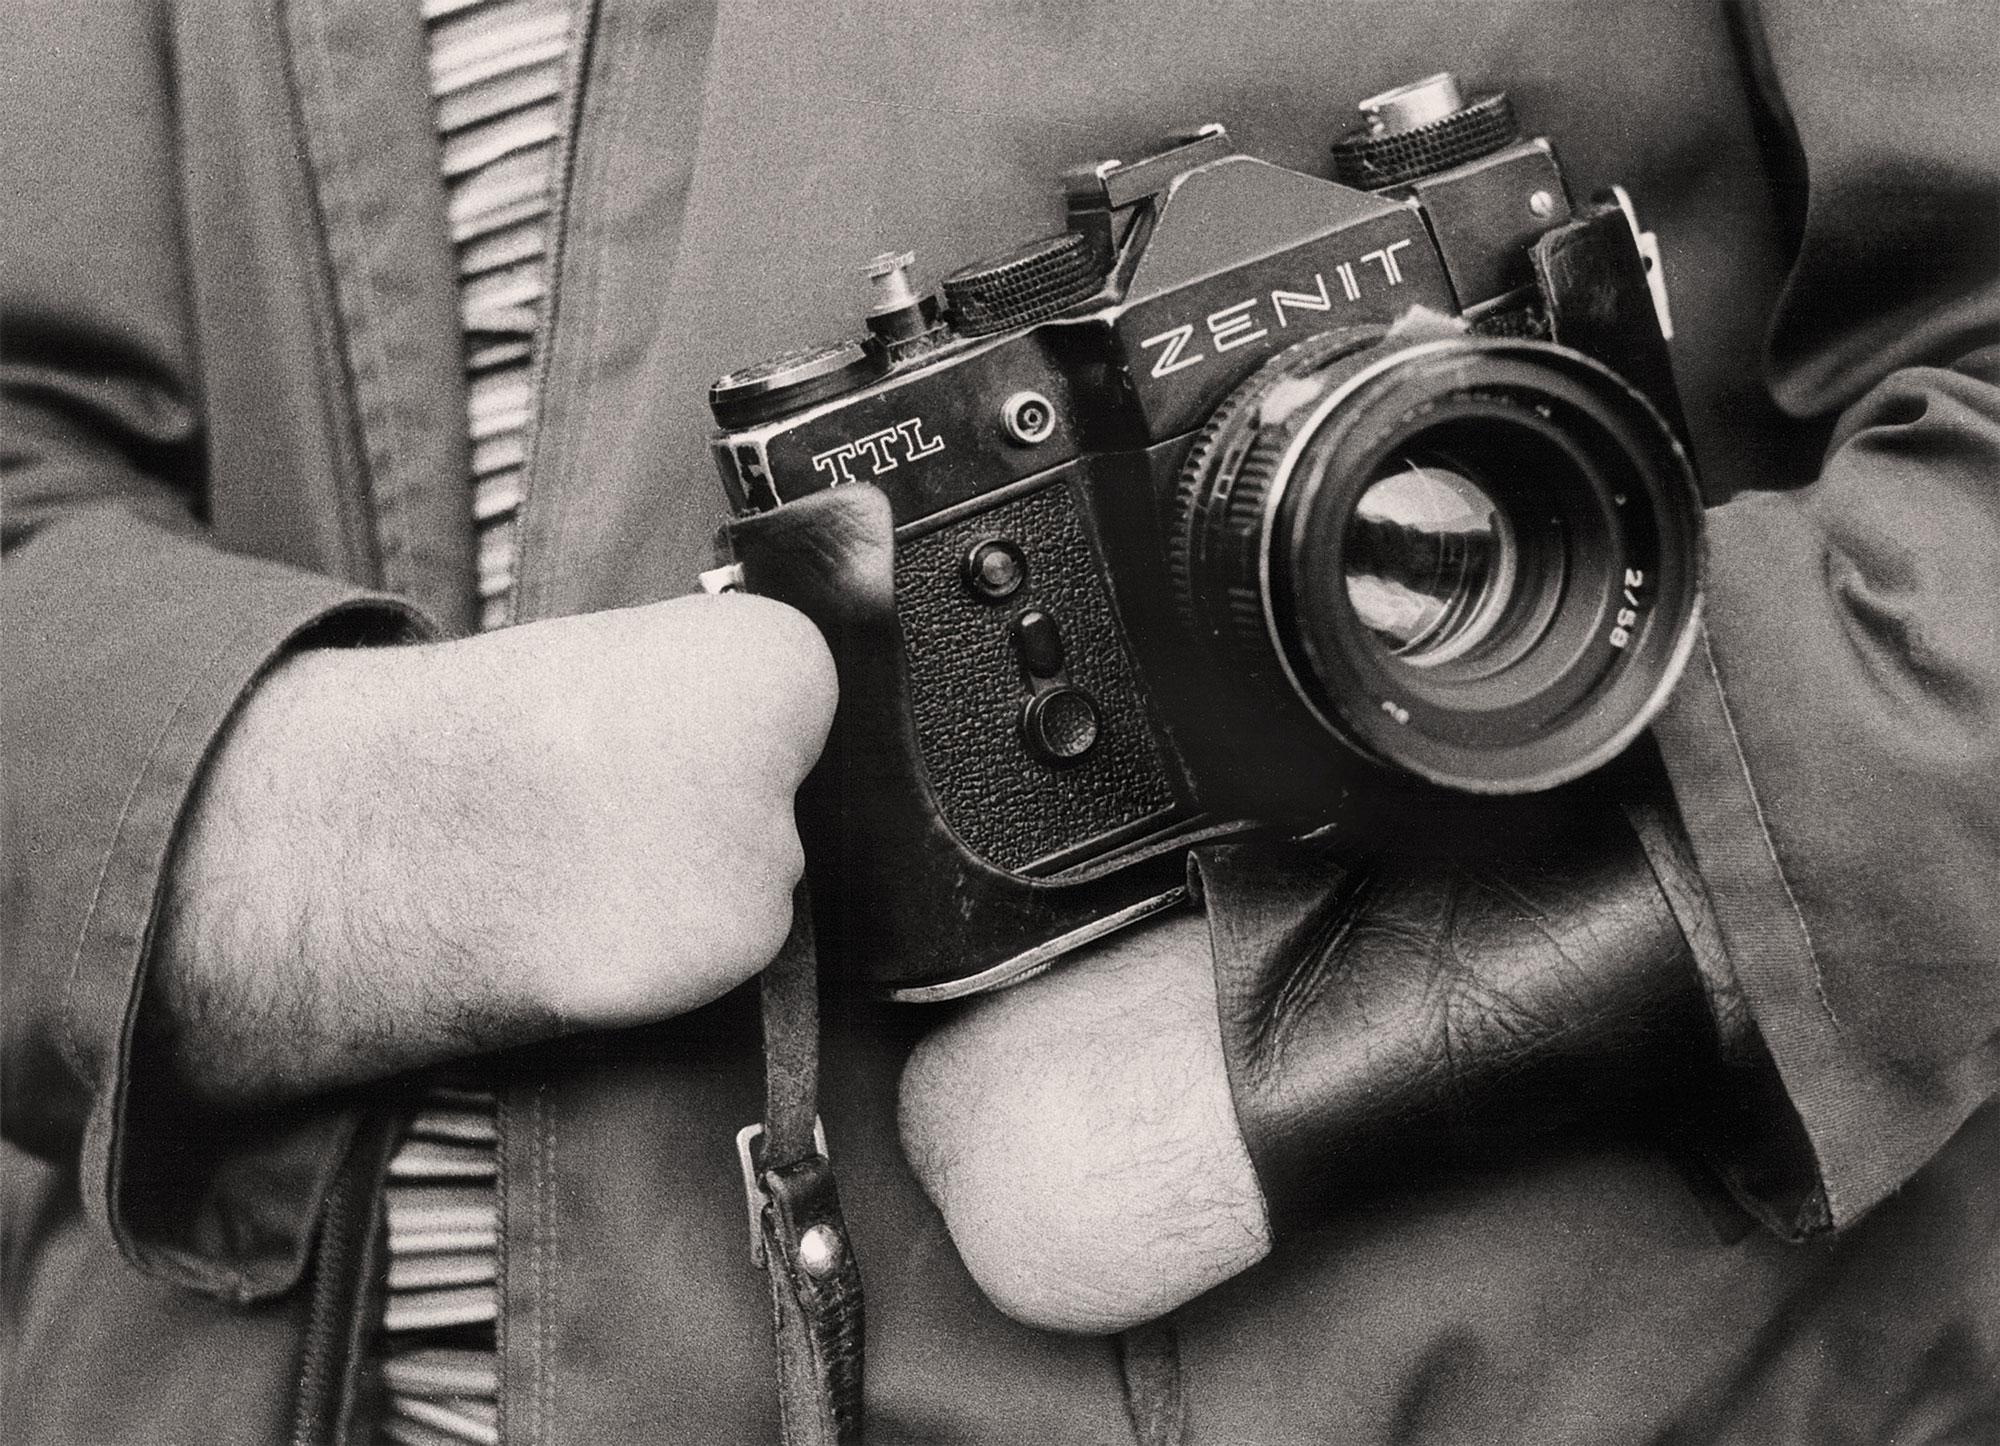 Professional Photographer | Jacko Vassilev – The Joy of Freedom | Luz Art Los Angeles, CA